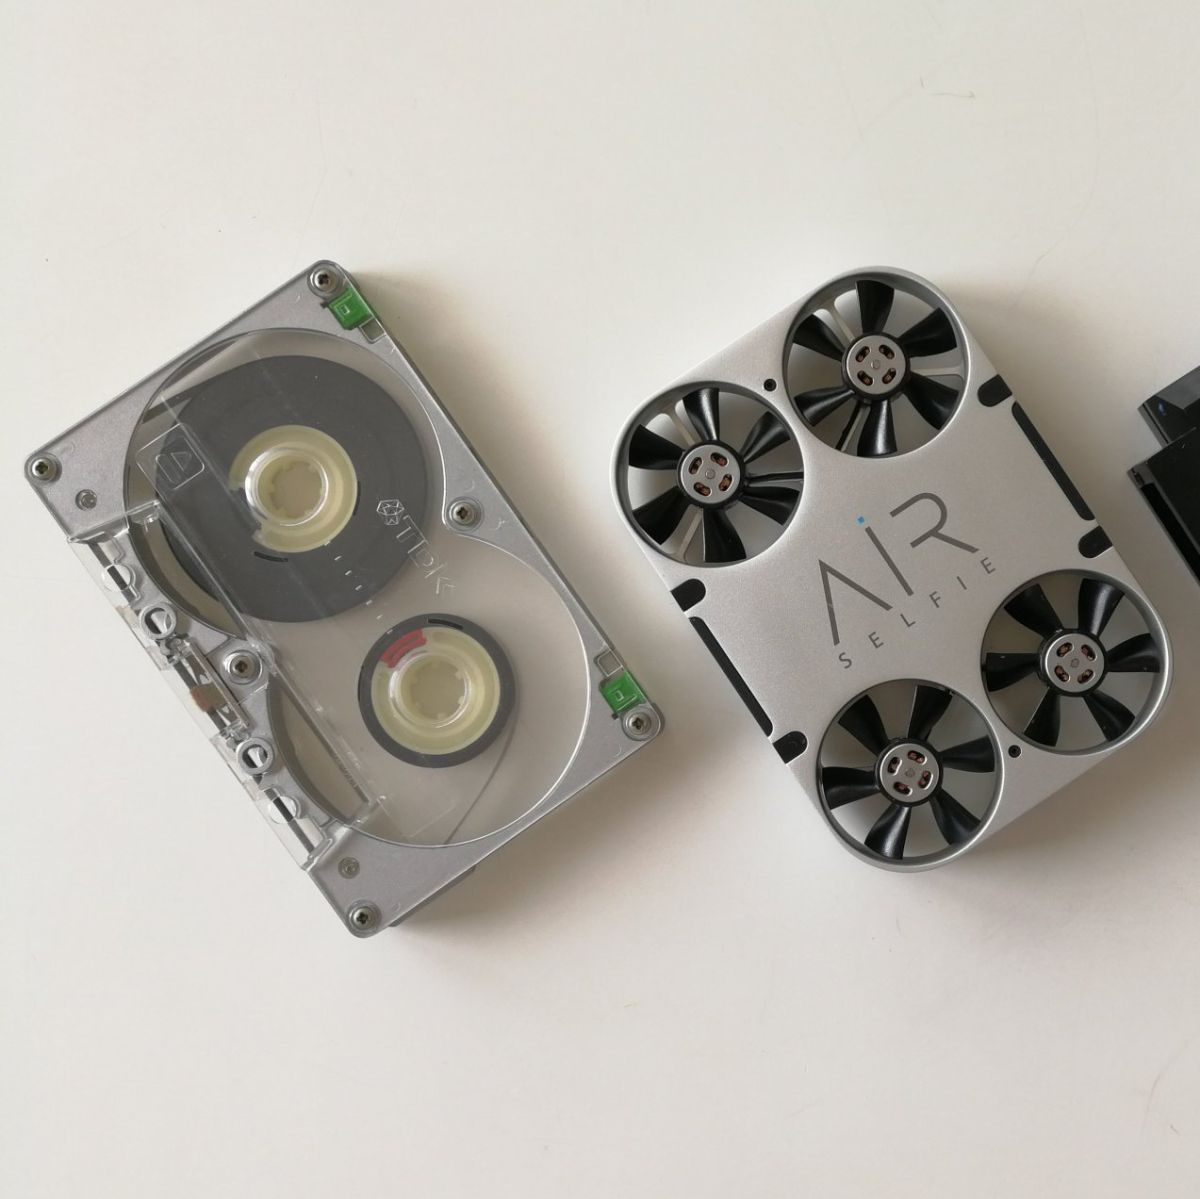 Ascii Jp 初心者にも安心の安定感 カセットテープ大の小型ドローン